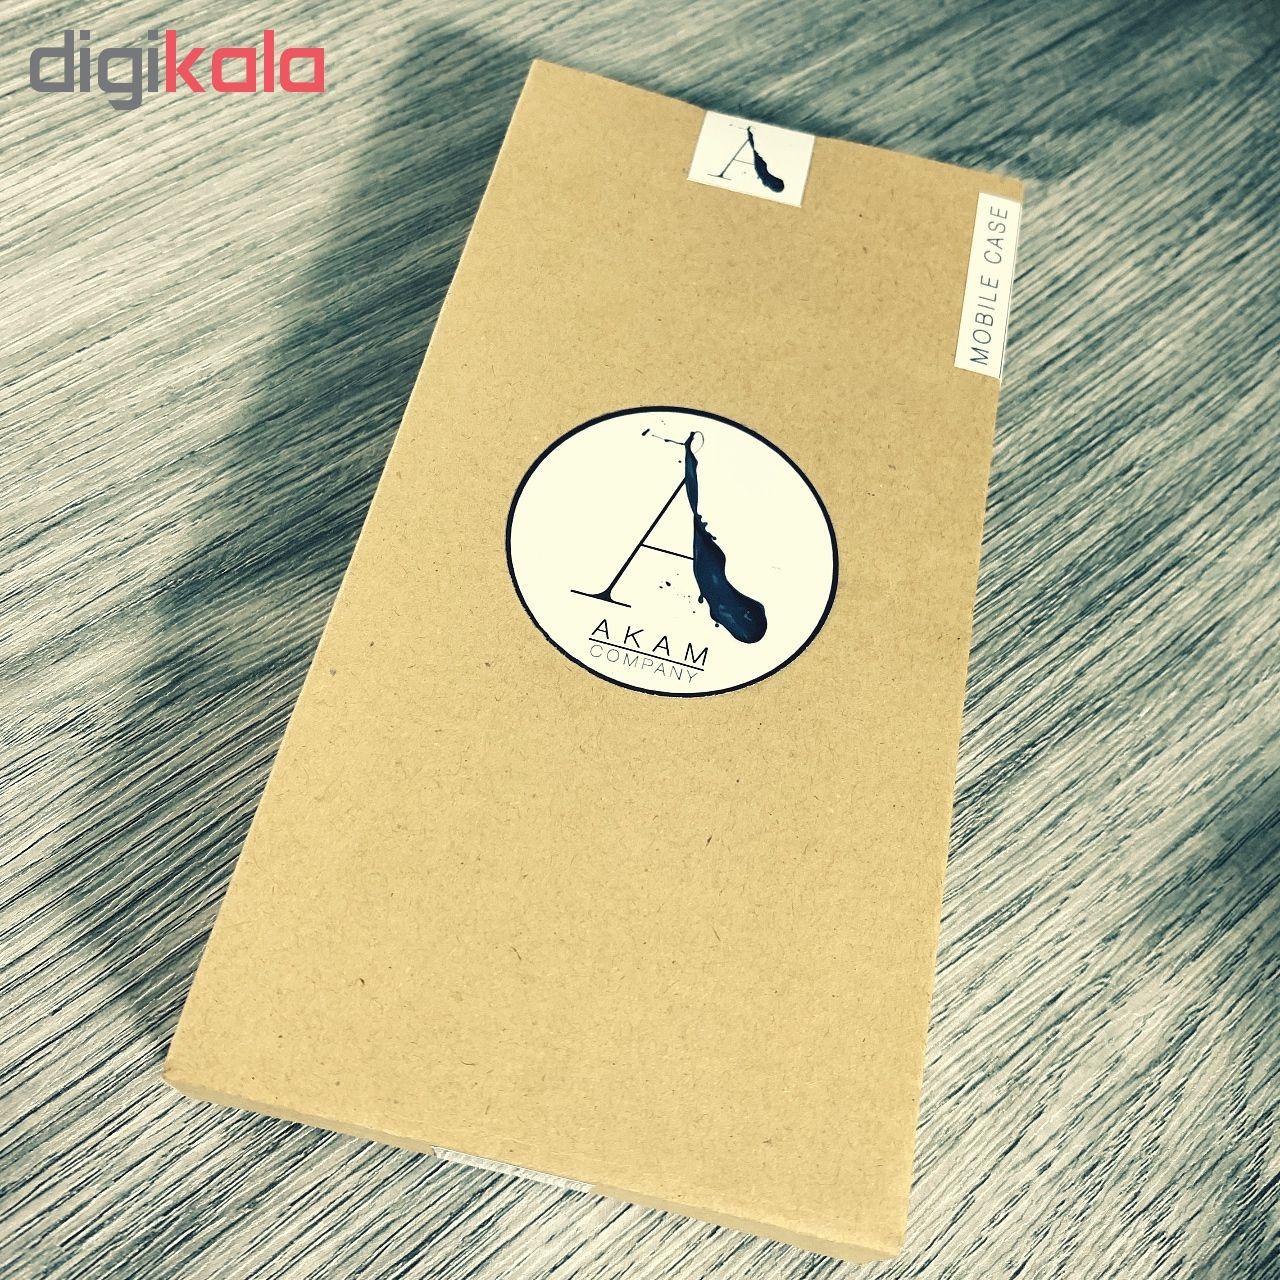 کاور آکام مدل AN91531 مناسب برای گوشی موبایل سامسونگ Galaxy Note 9 main 1 2